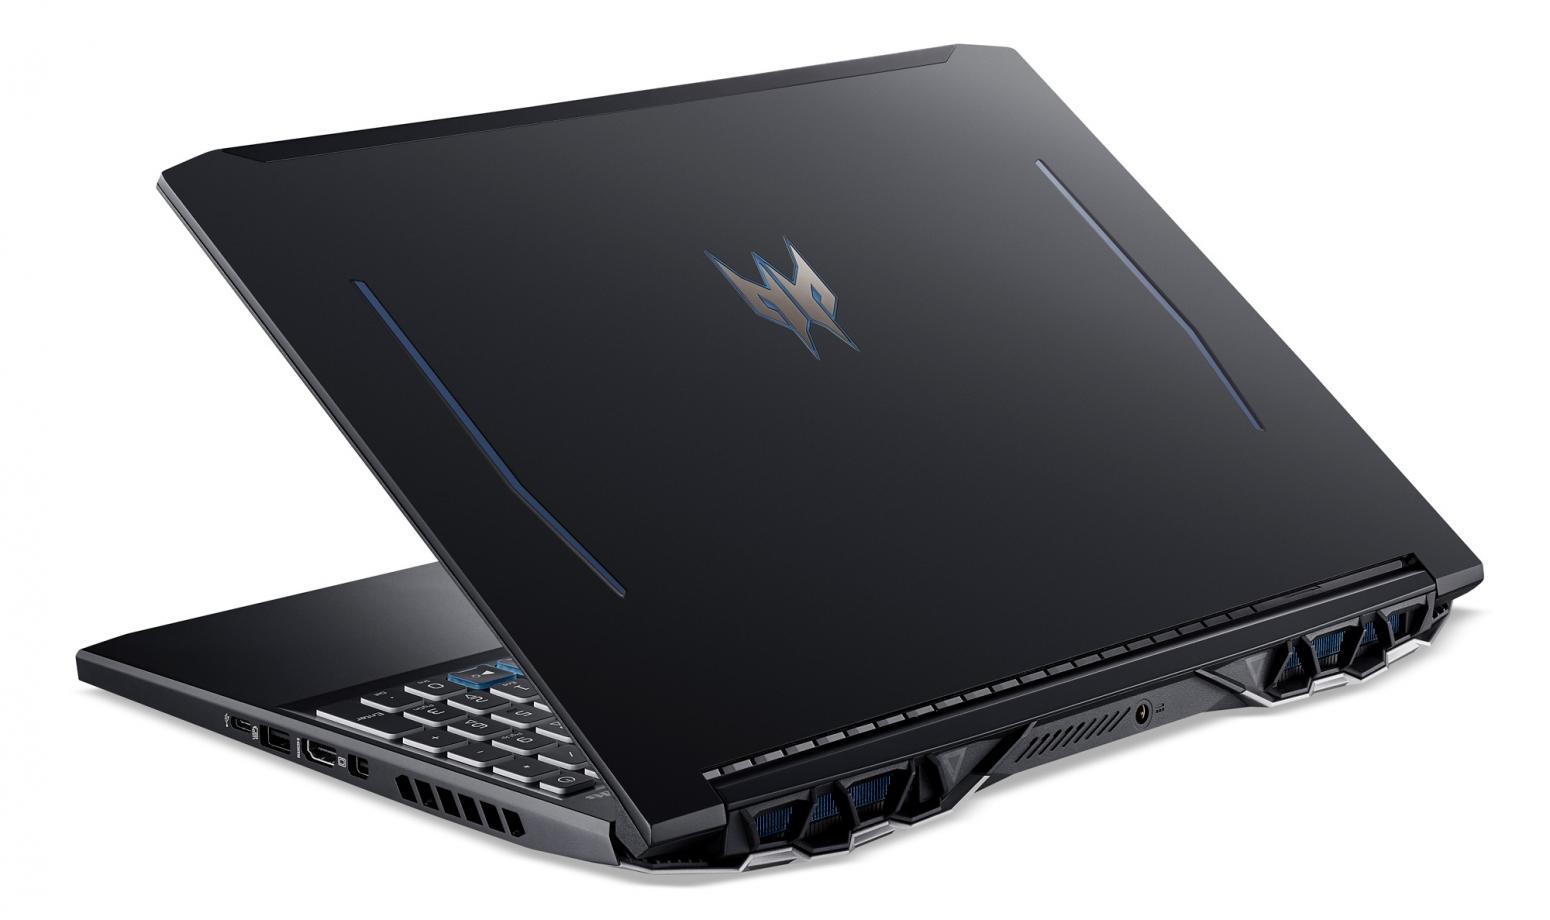 Image du PC portable Acer Predator Helios PH315-53-70A9 - RTX 3080, 144Hz